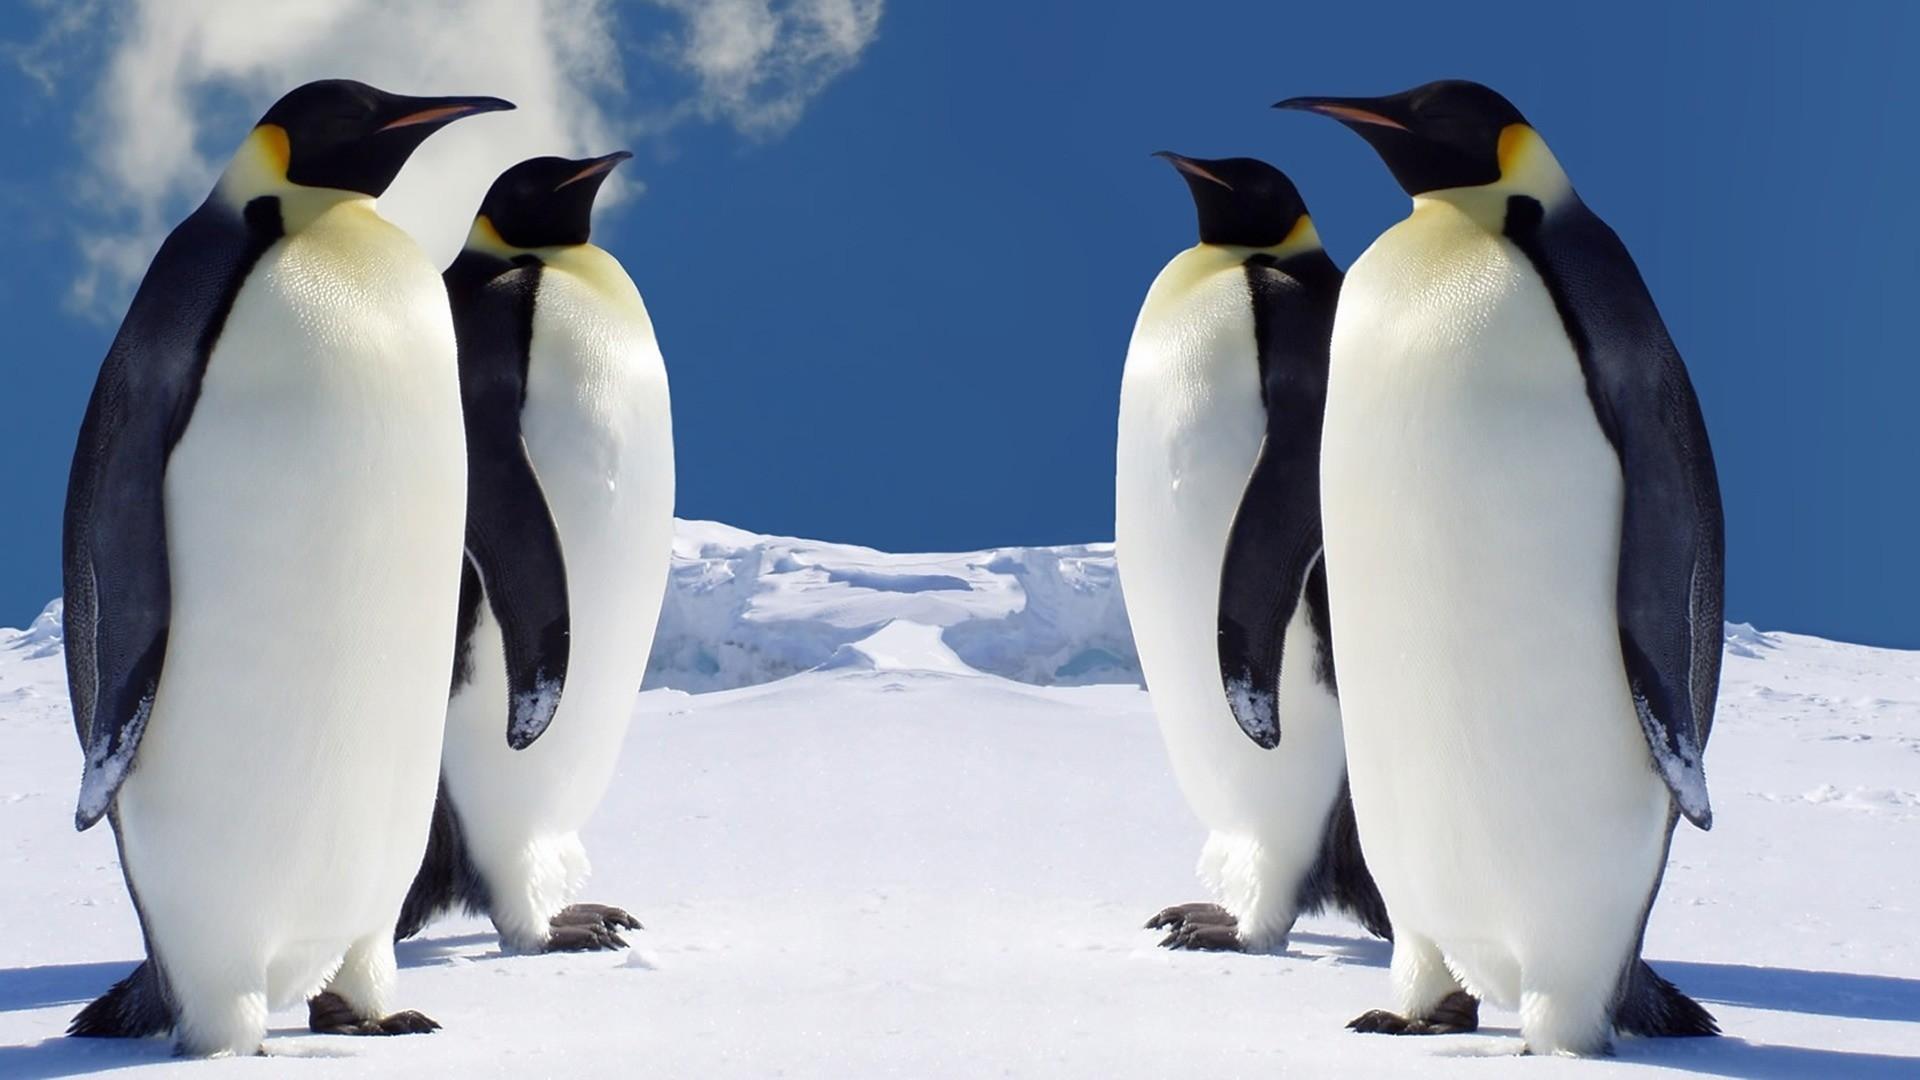 4 Emperor Penguins Wallpaper Penguins Animals